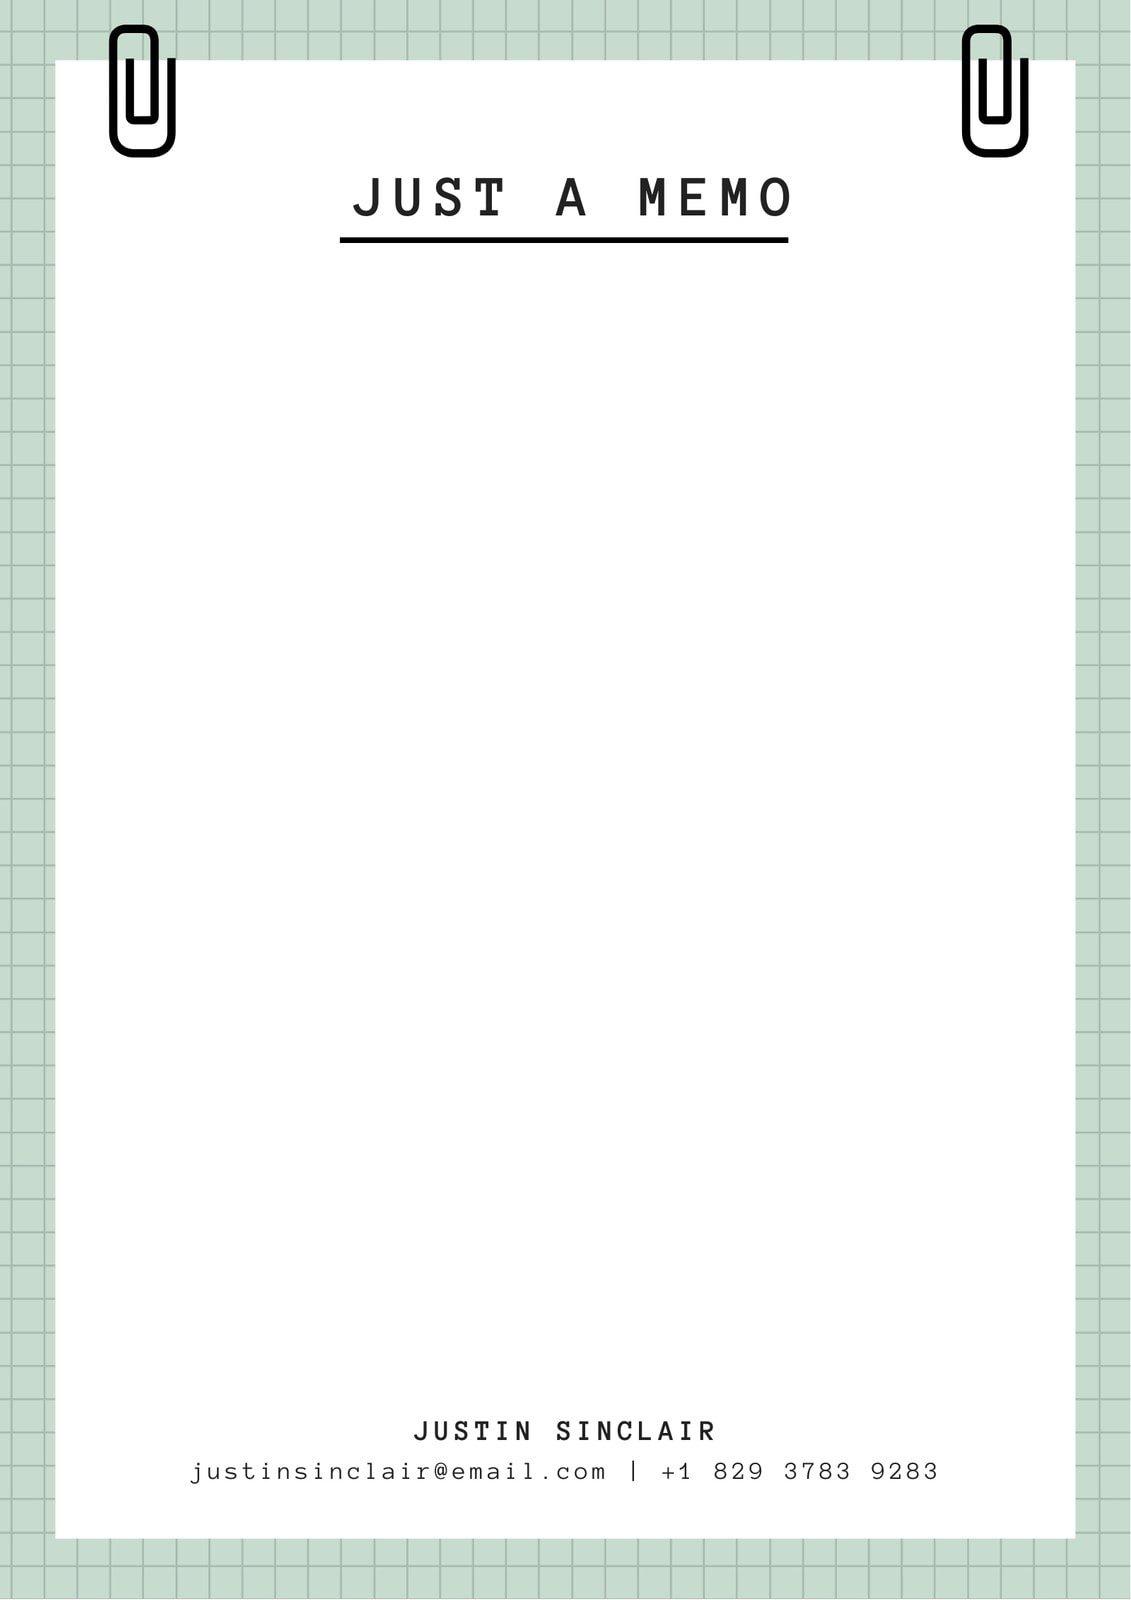 Pale Green Grid Minimalist Paperclip General Memo